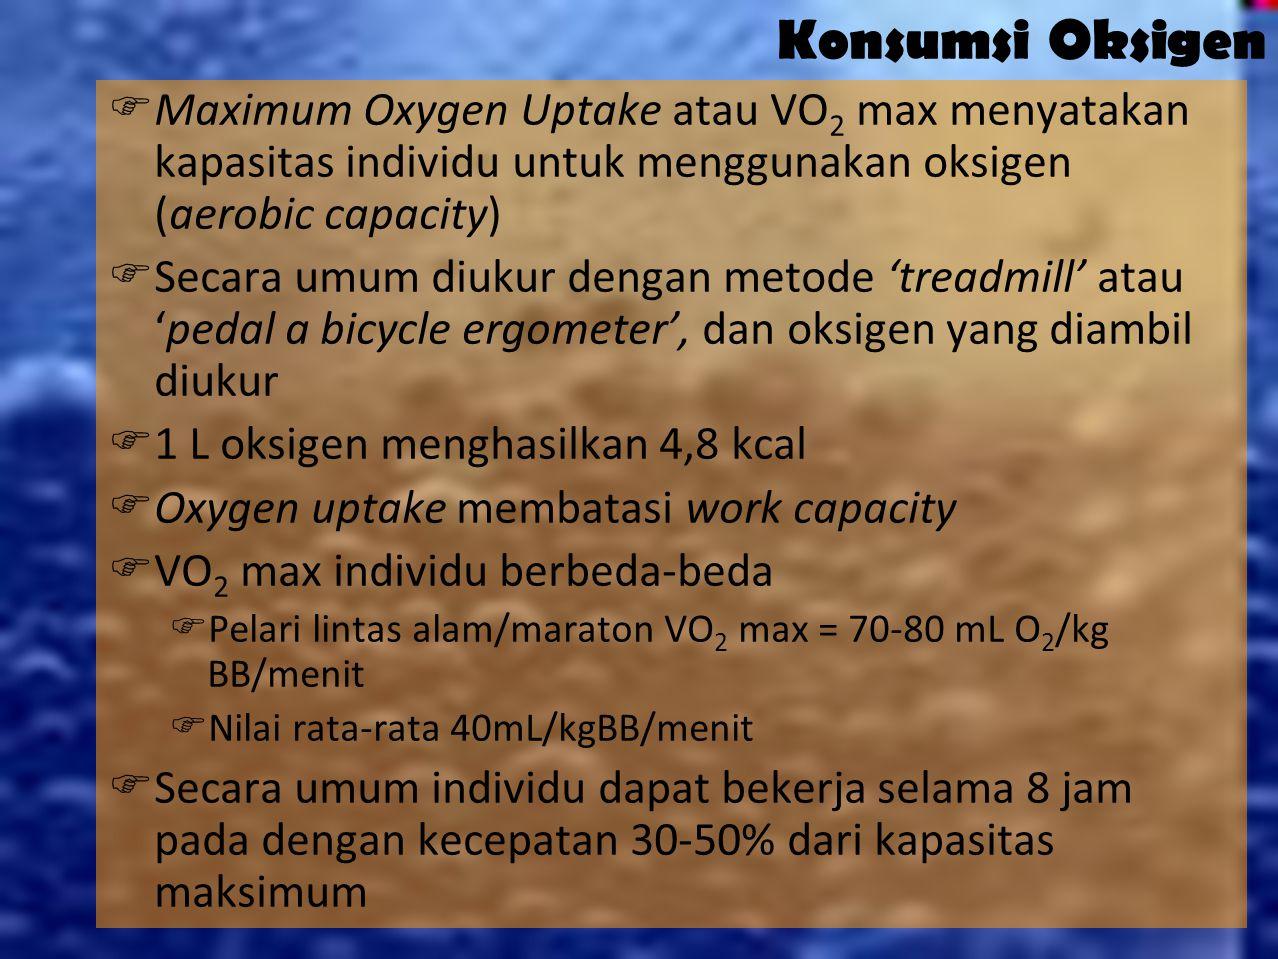 19 Menghitung Kebutuhan Kalori KALORI BASAL Laki-laki : BB (kg) x 30 kalori/kg =.......